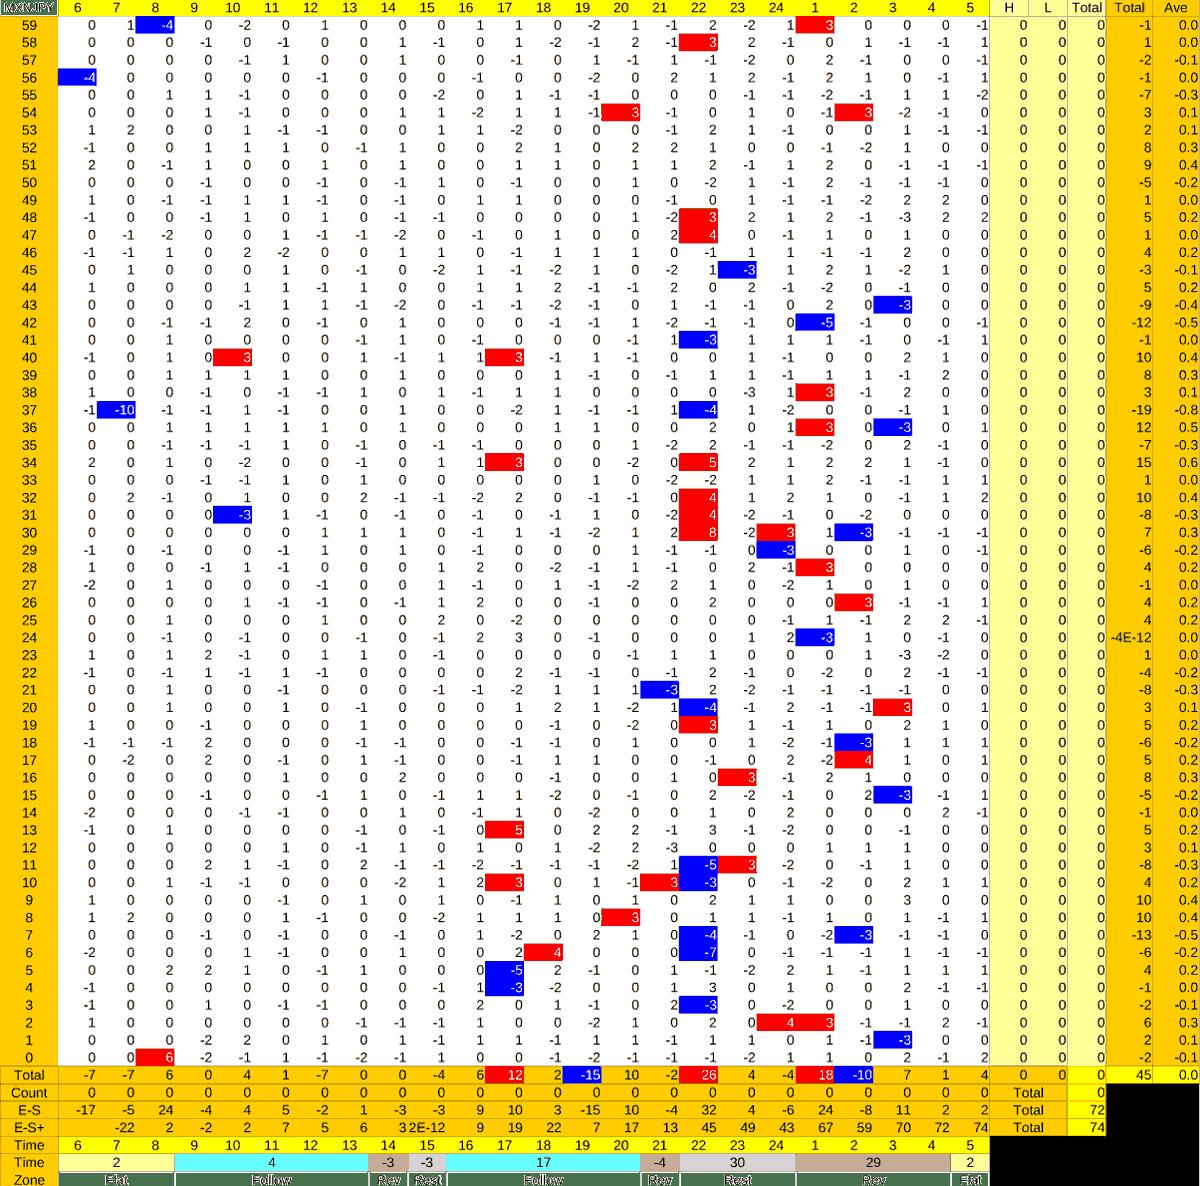 20210310_HS(3)MXNJPY